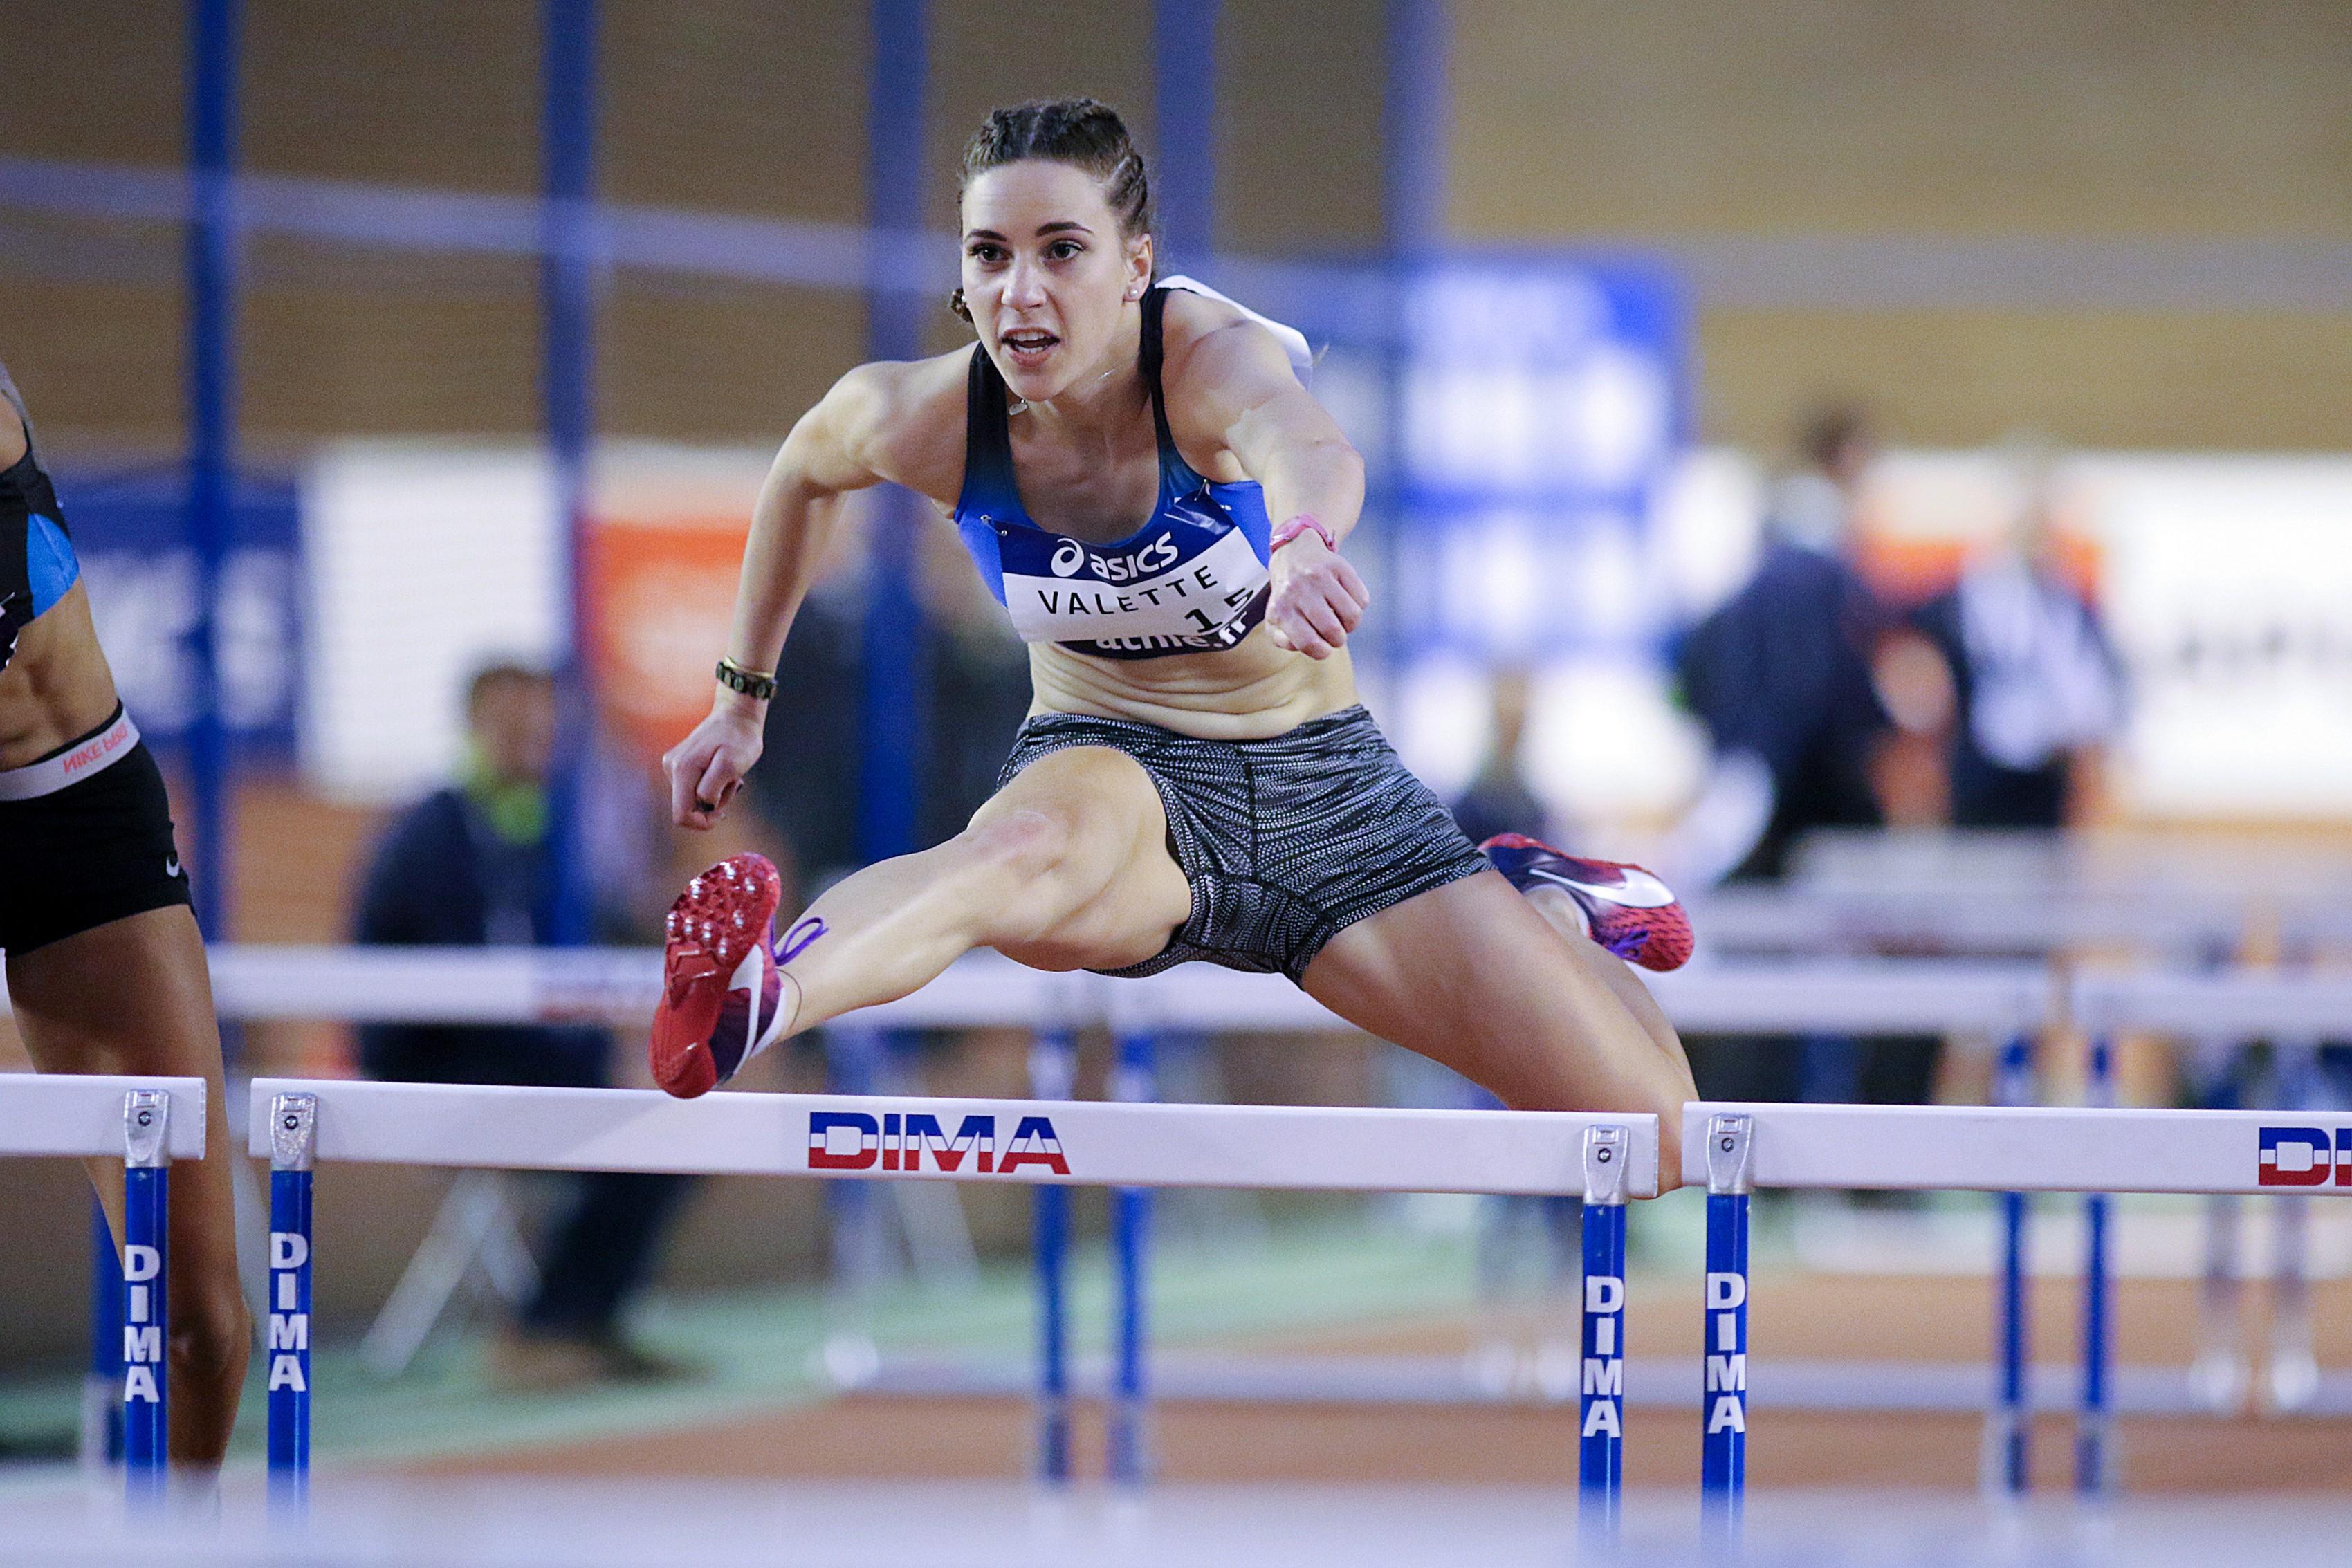 Laura Valette en stage national à Marseille